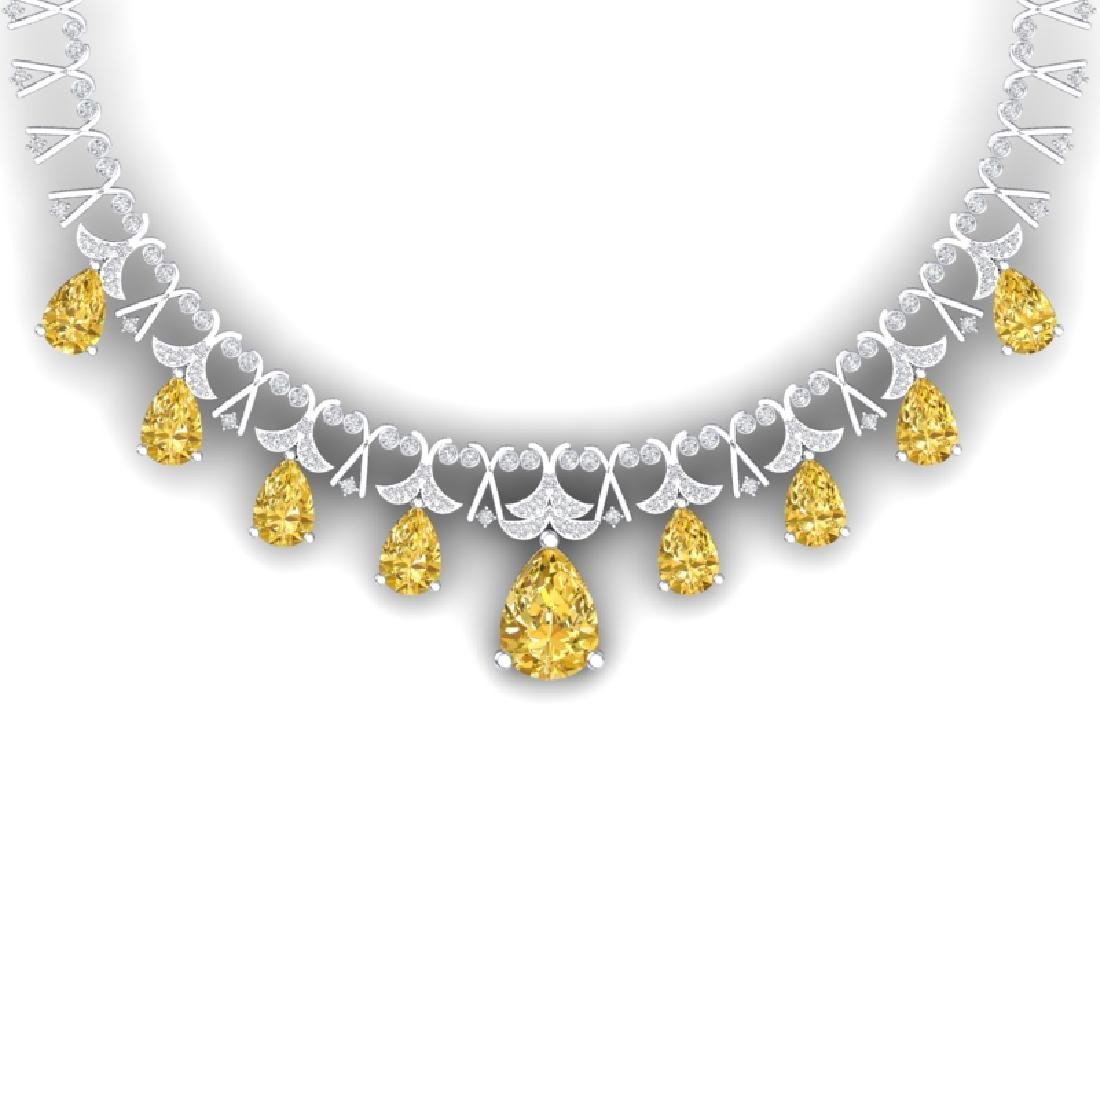 55.49 CTW Royalty Canary Citrine & VS Diamond Necklace